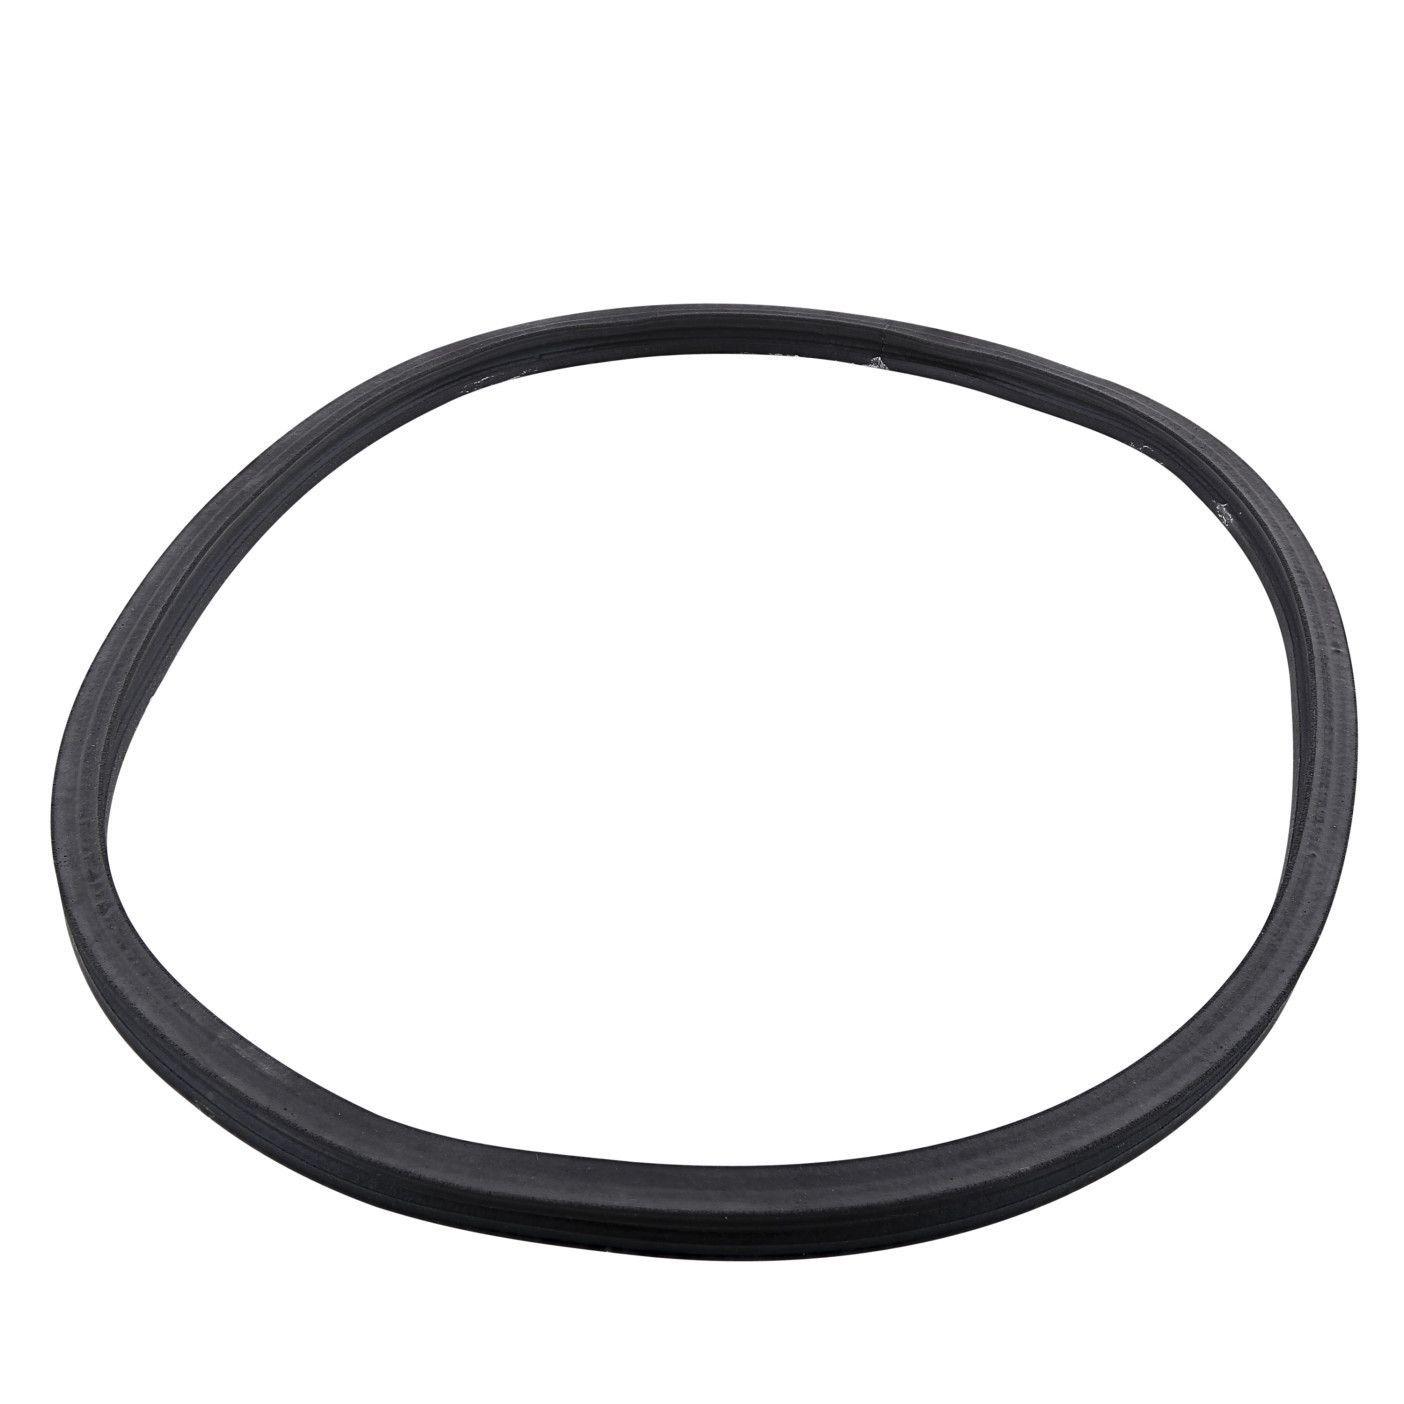 Door Seal Front for AEG Electrolux Tumble Dryers AEG / Electrolux / Zanussi